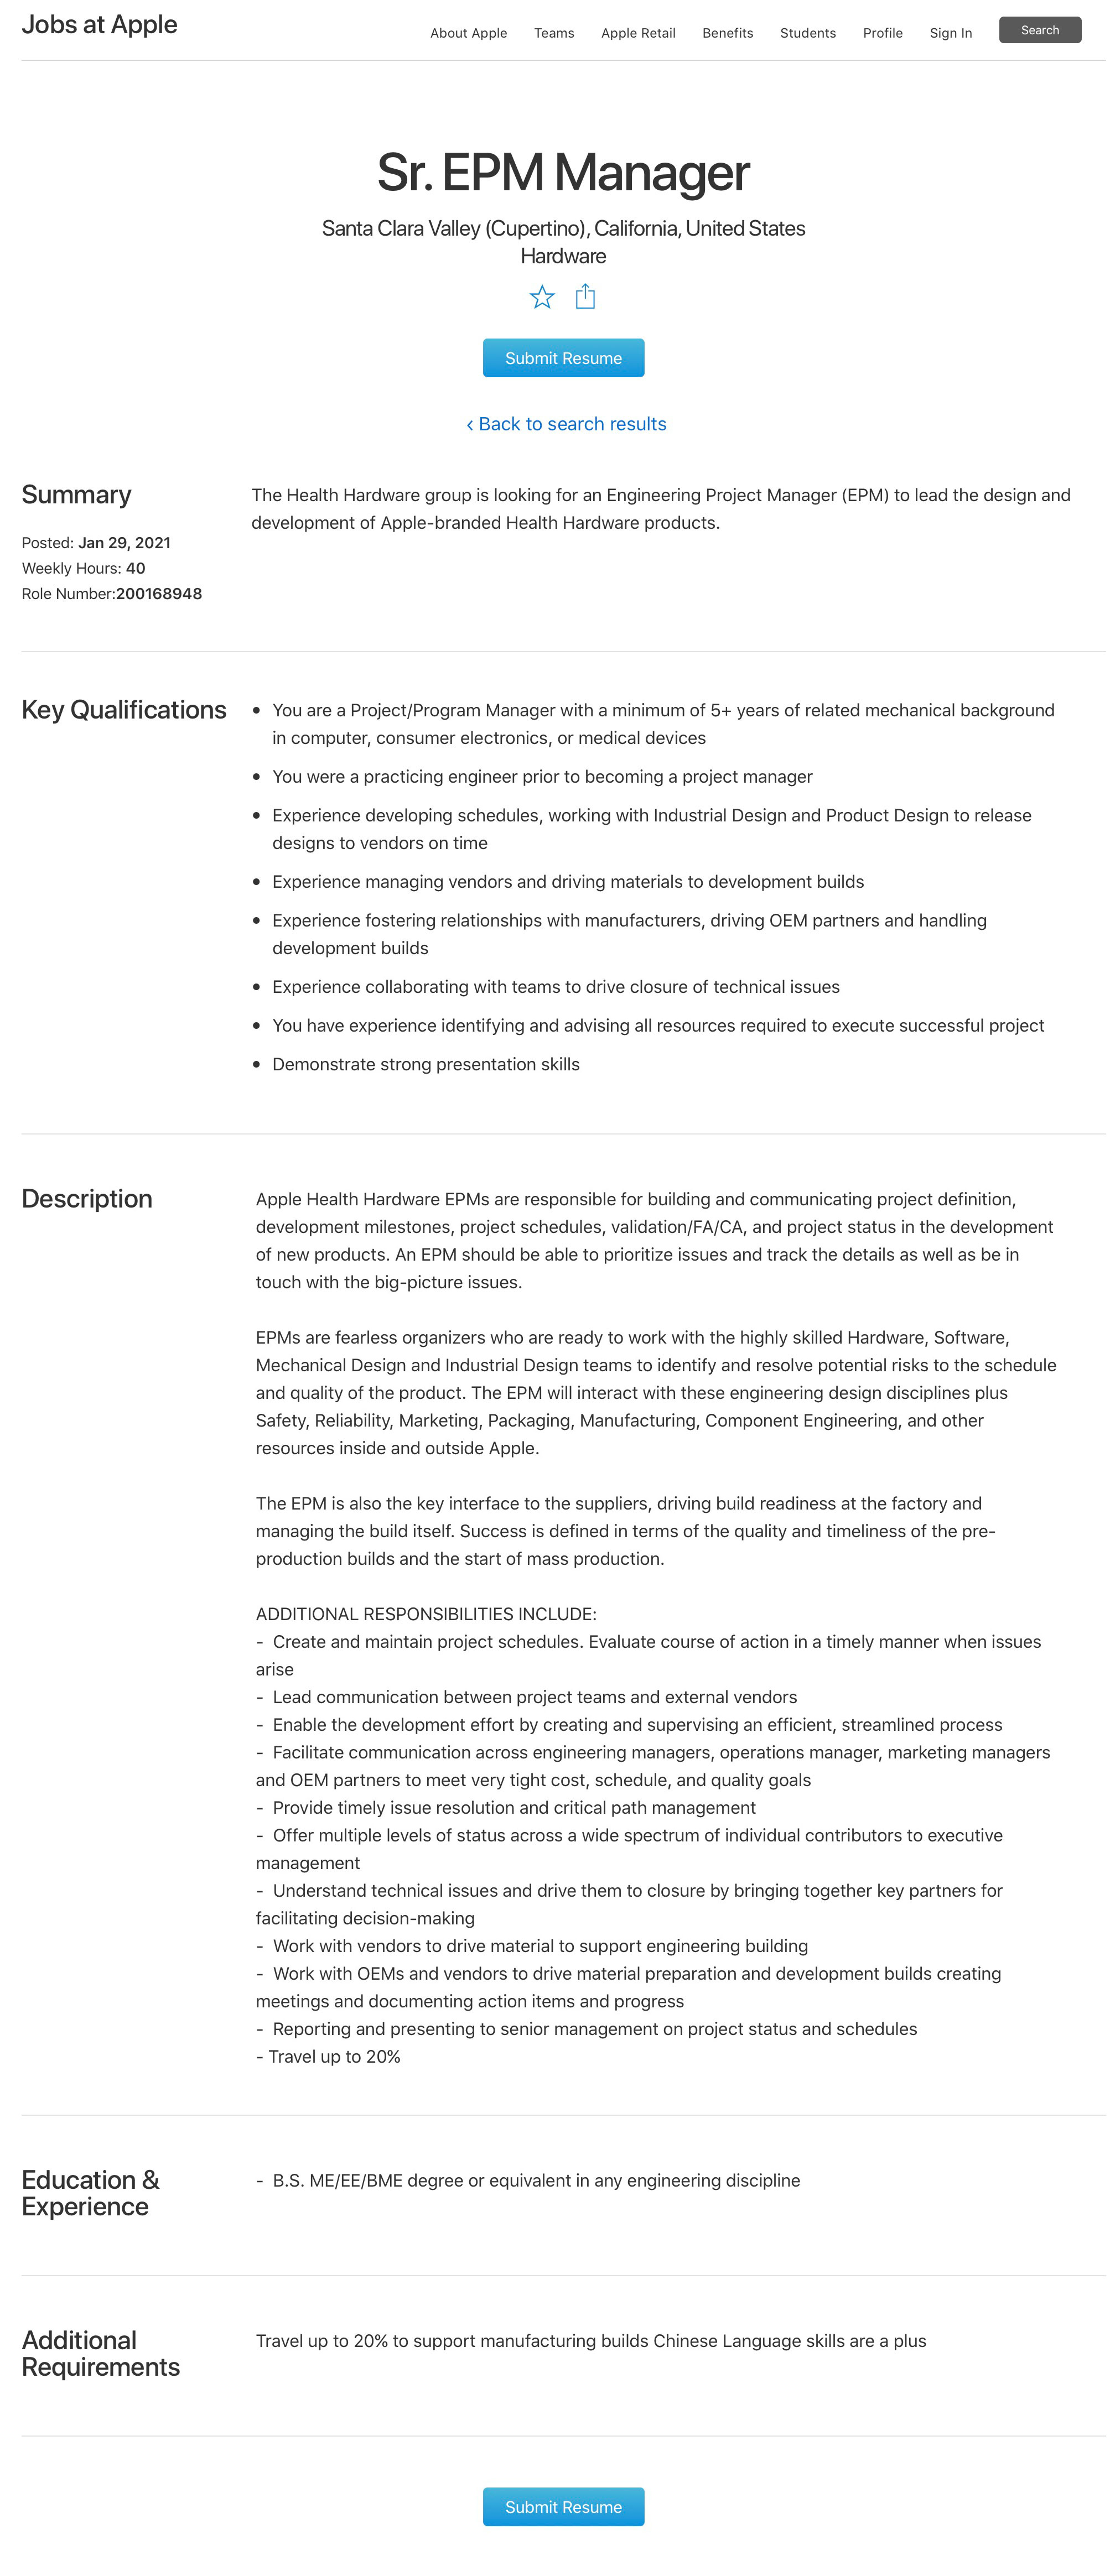 https://www.macfreak.nl/modules/news/images/zArt.AppleZoektManagerHealthHardwareProducts.jpg